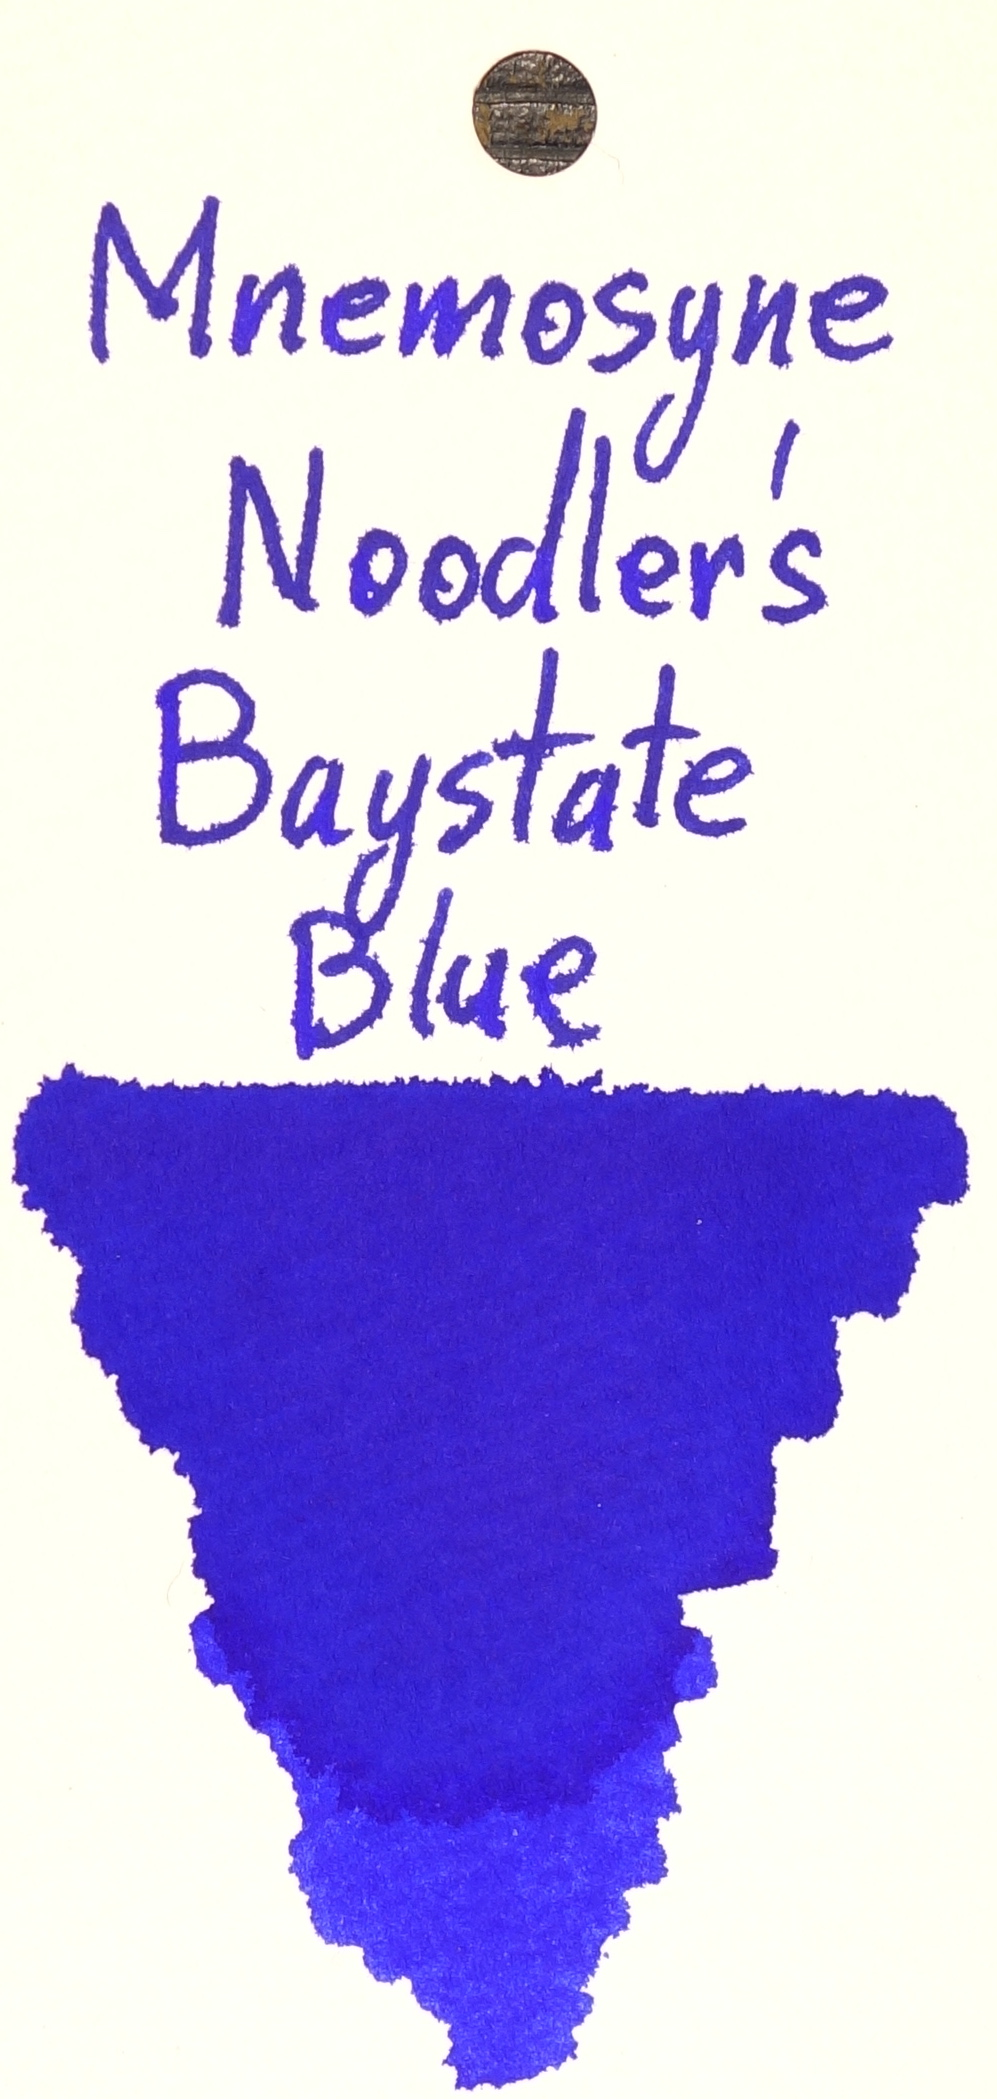 Noodler's Baystate Blue Mnemosyne.JPG